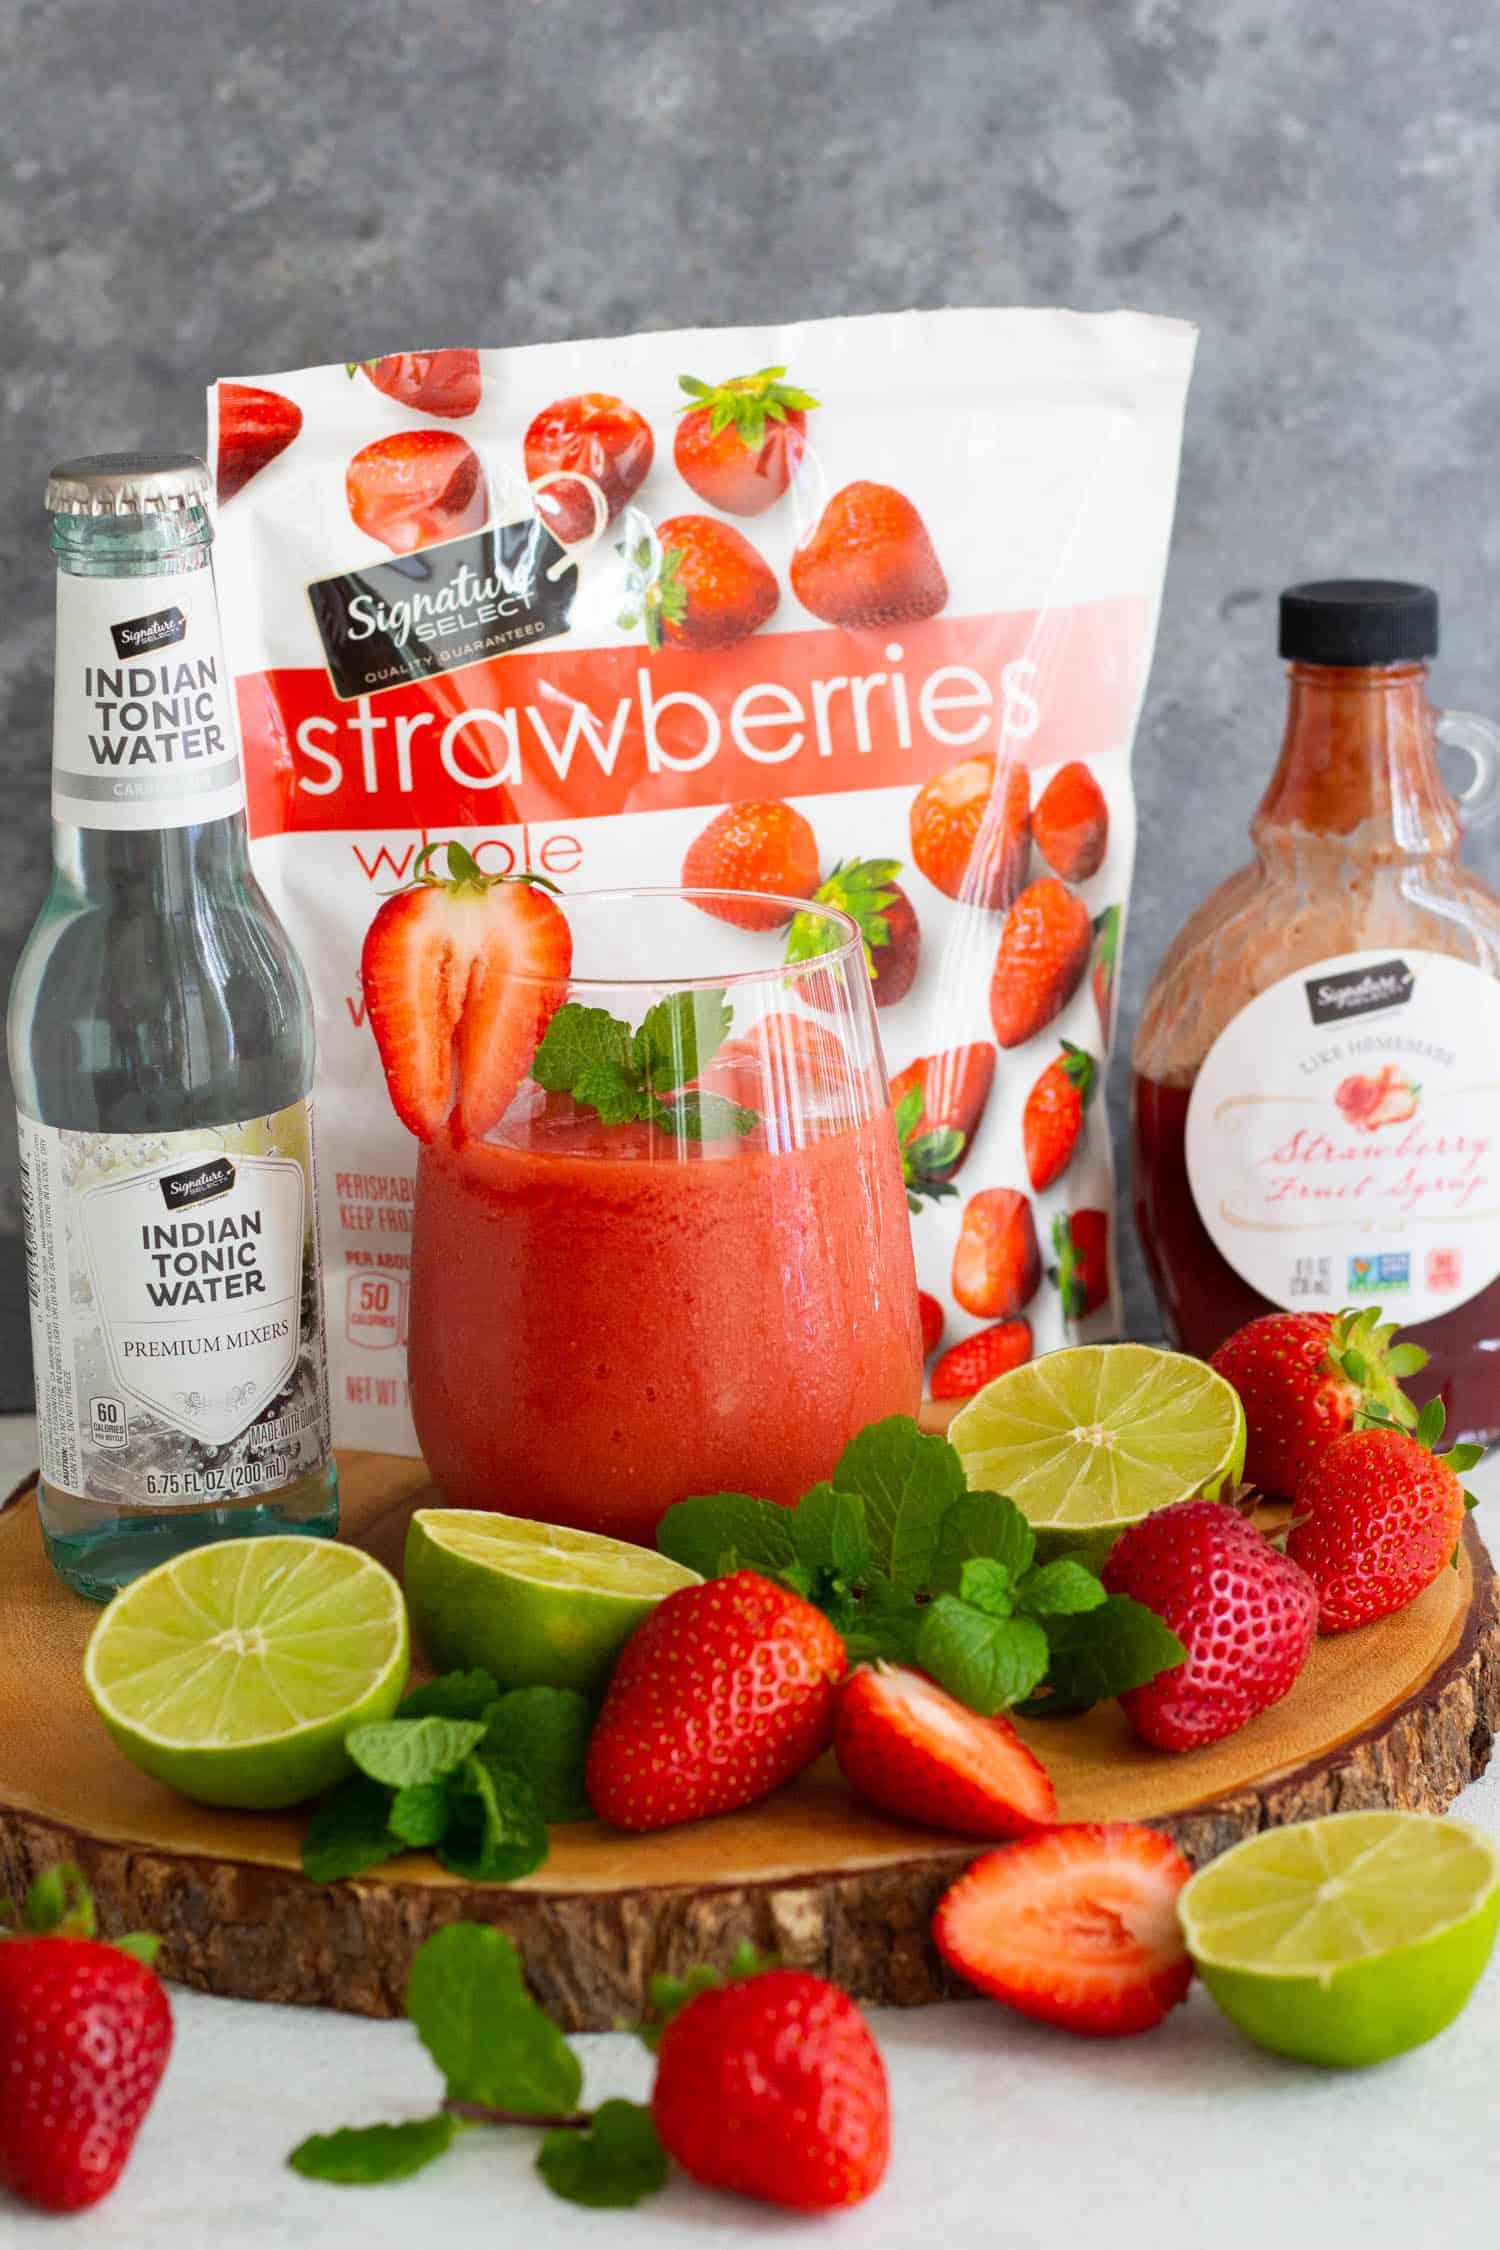 Virgin strawberry daiquiri with ingredients.